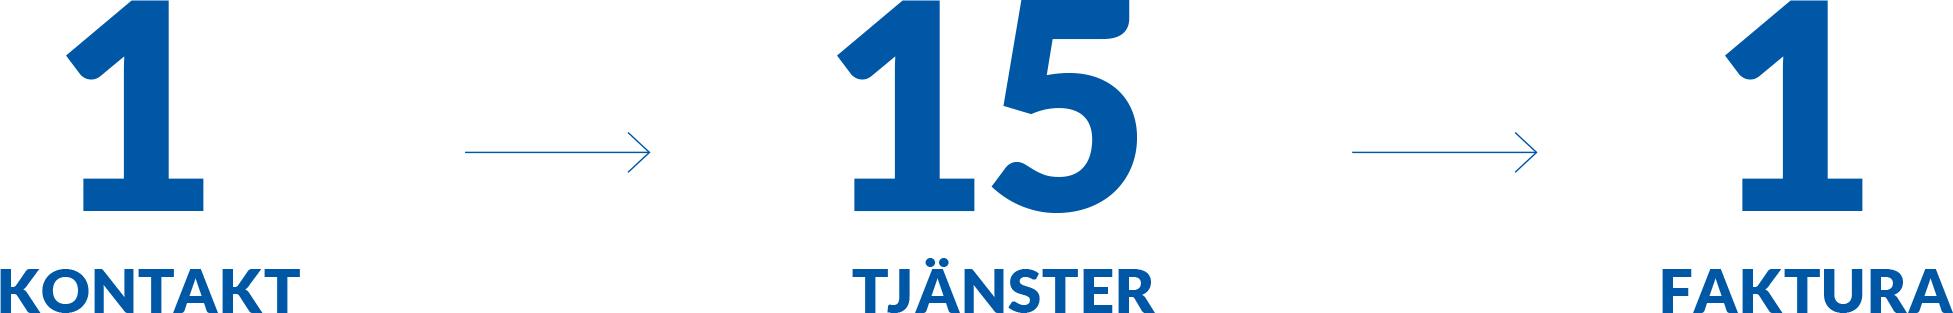 1-15-1